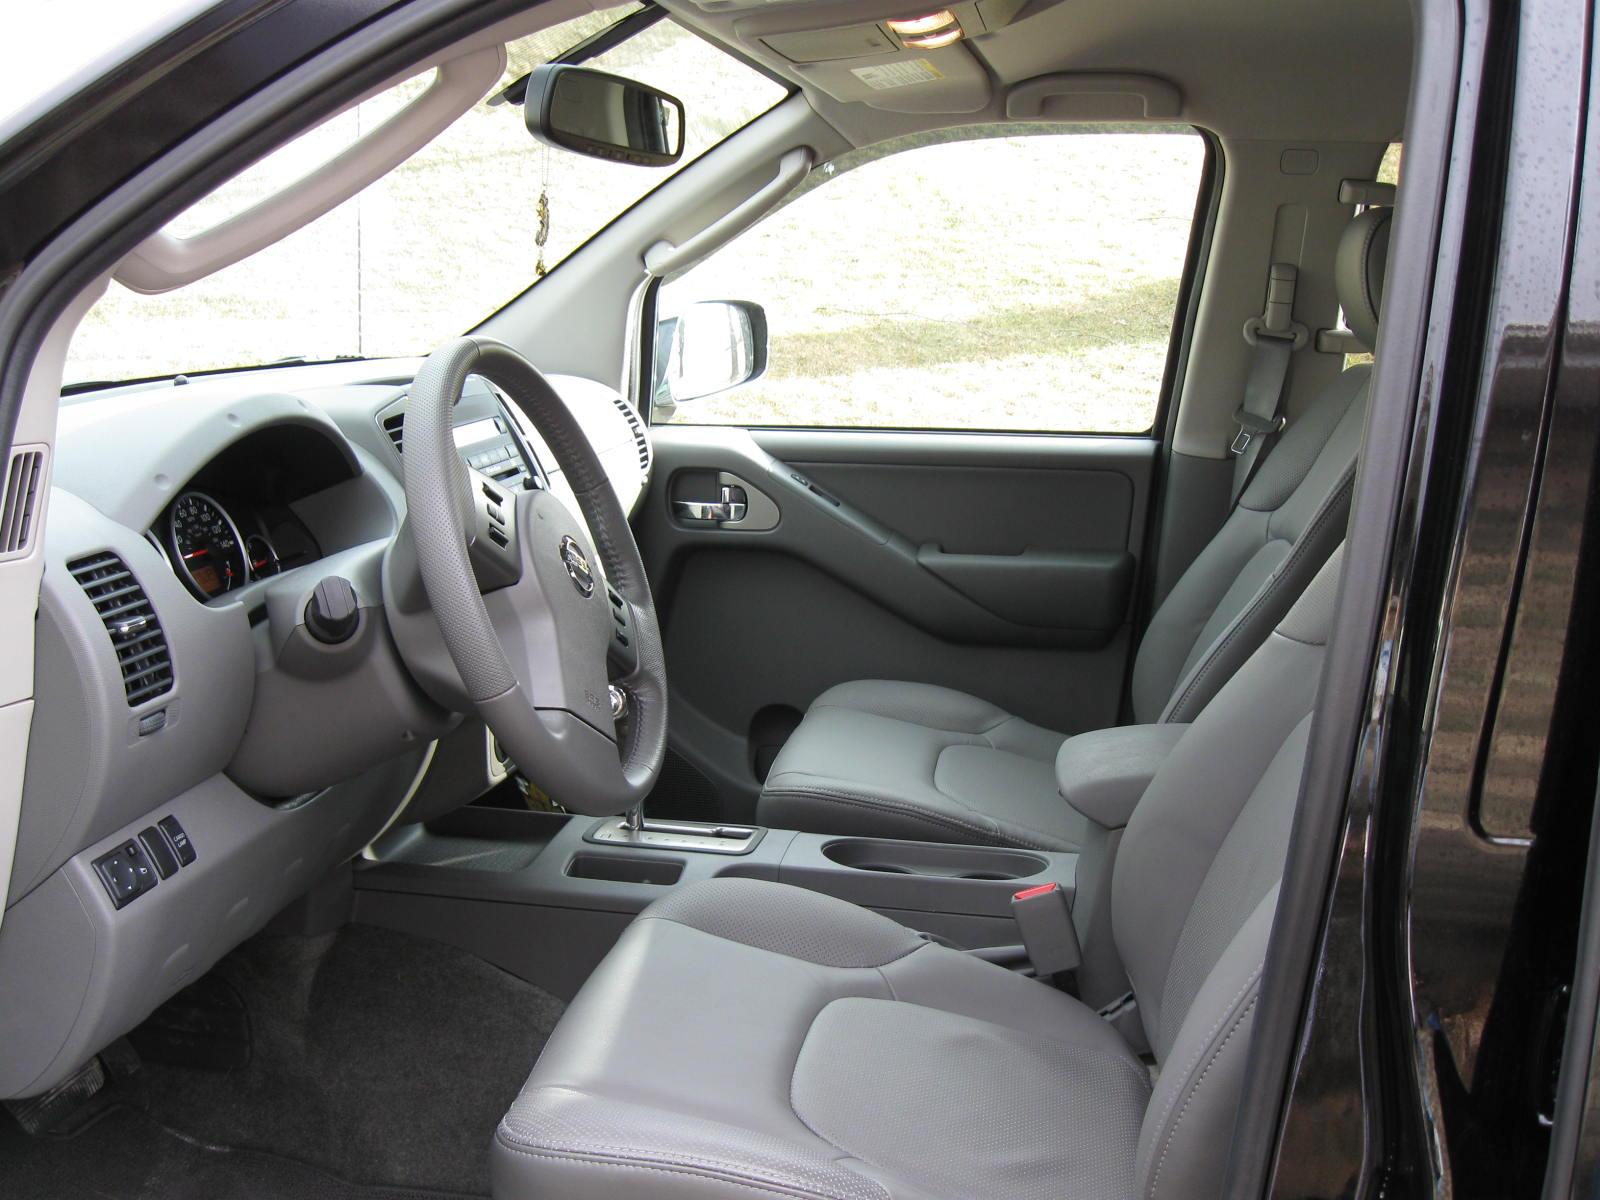 Nissan Frontier Le Picture 2 Reviews News Specs Buy Car